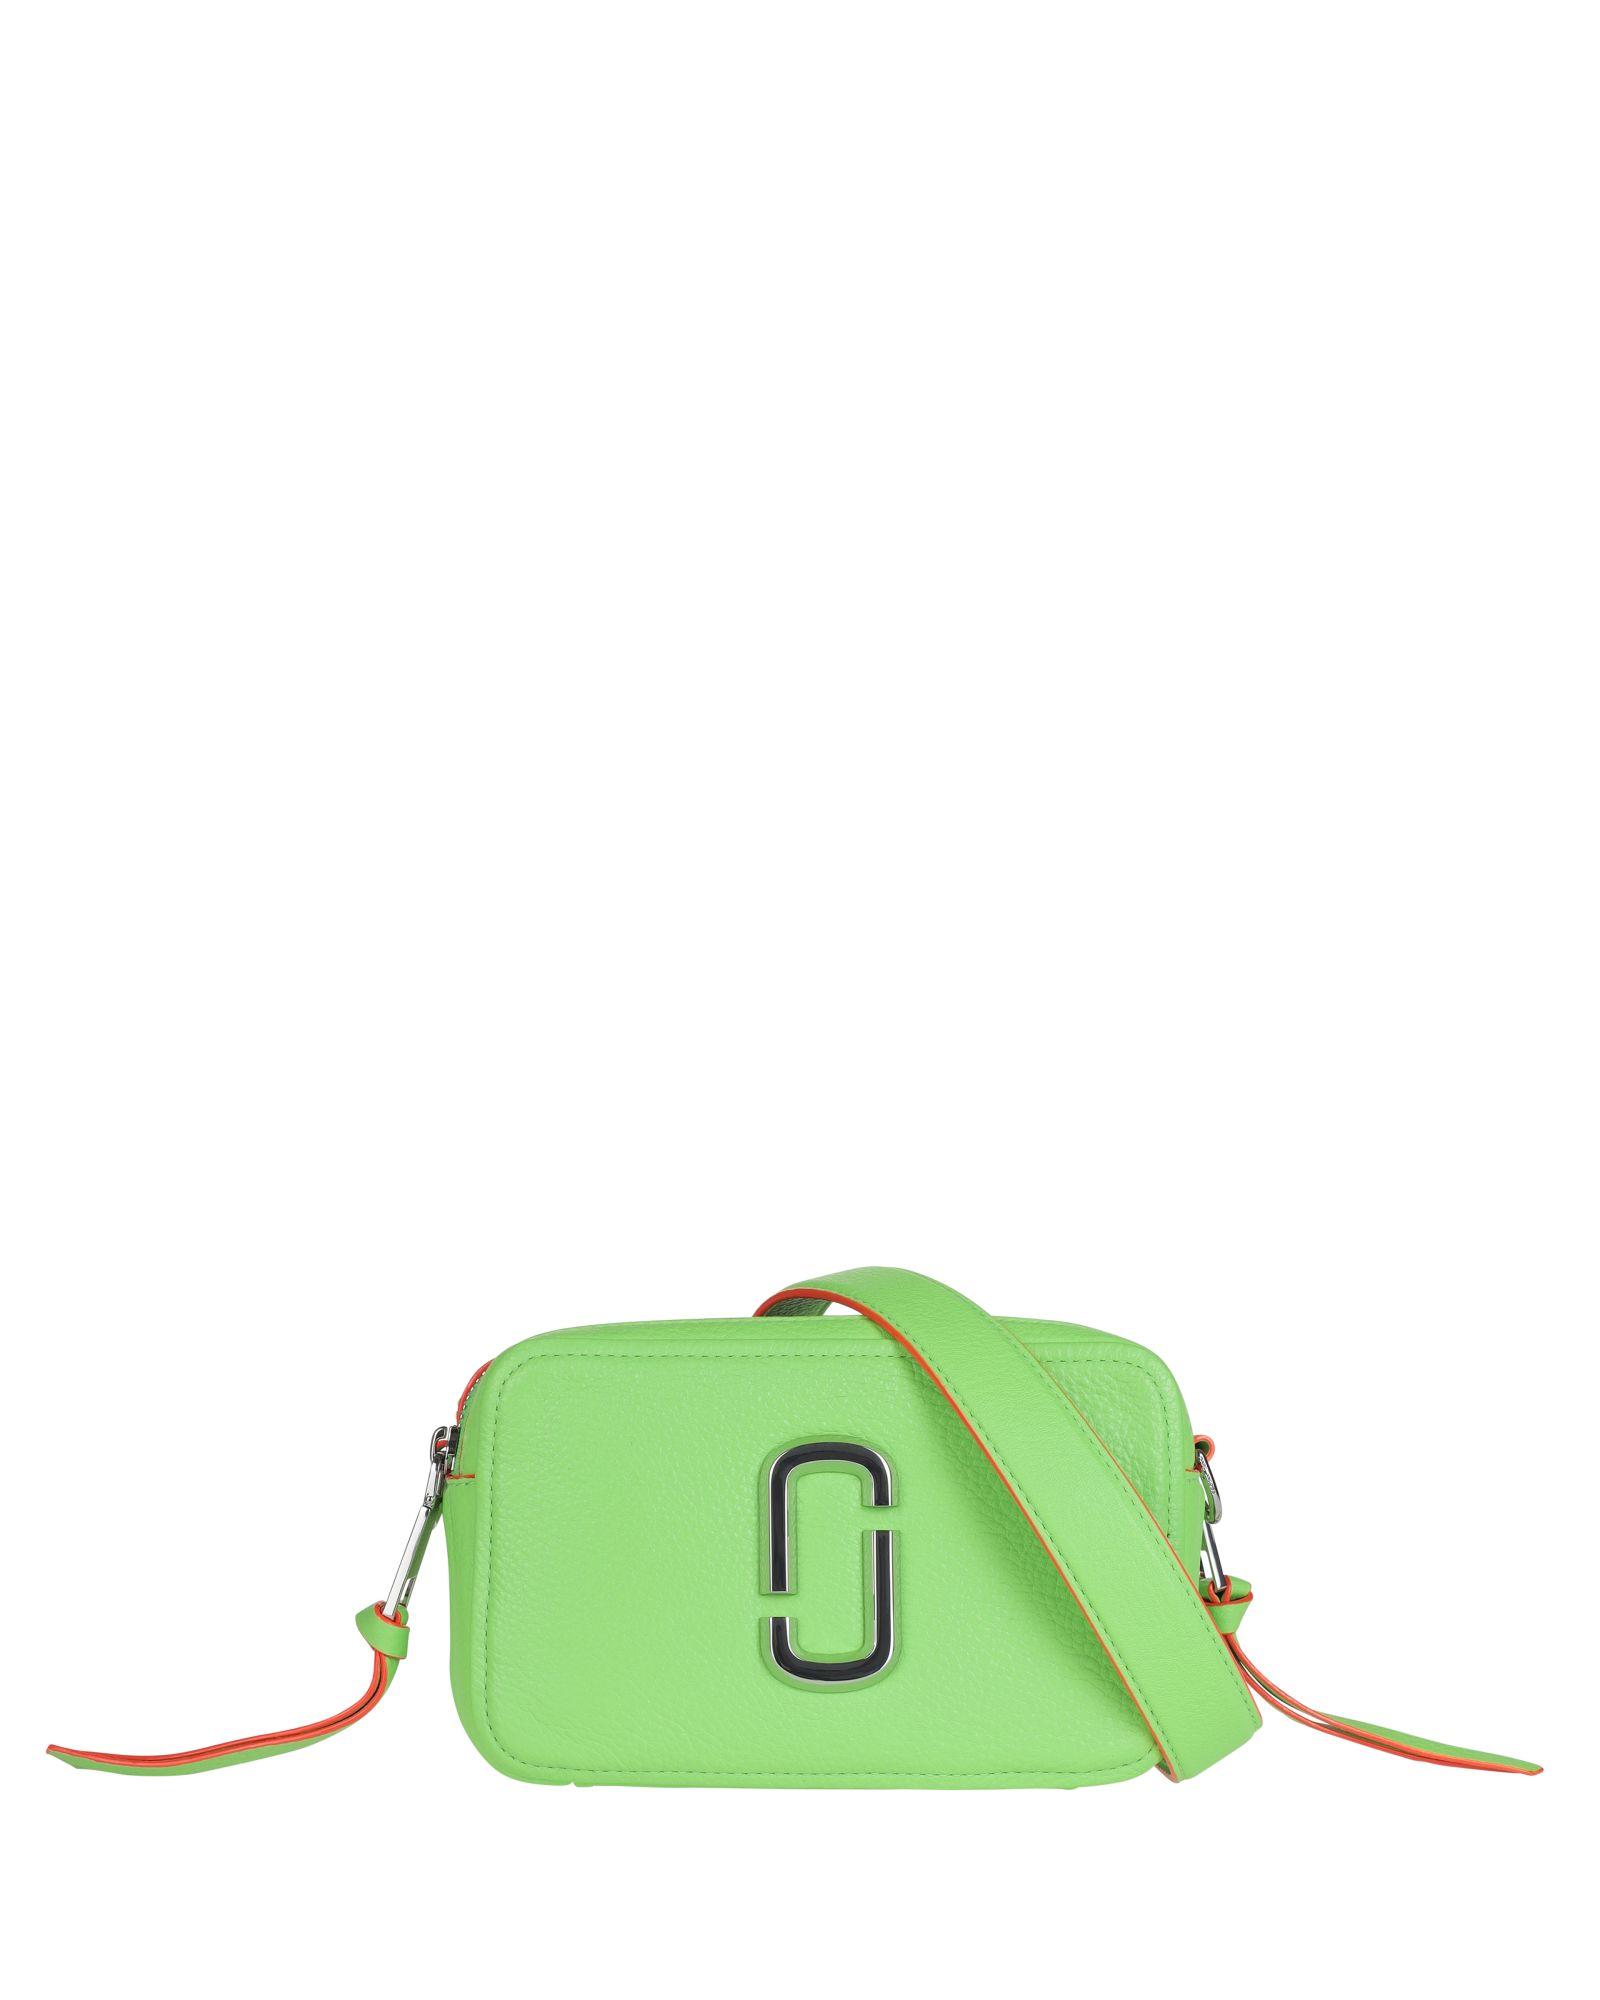 dd6bb0e2f1c Marc Jacobs Marc Jacobs The Softshot 21 Shoulder Bag - Verde ...